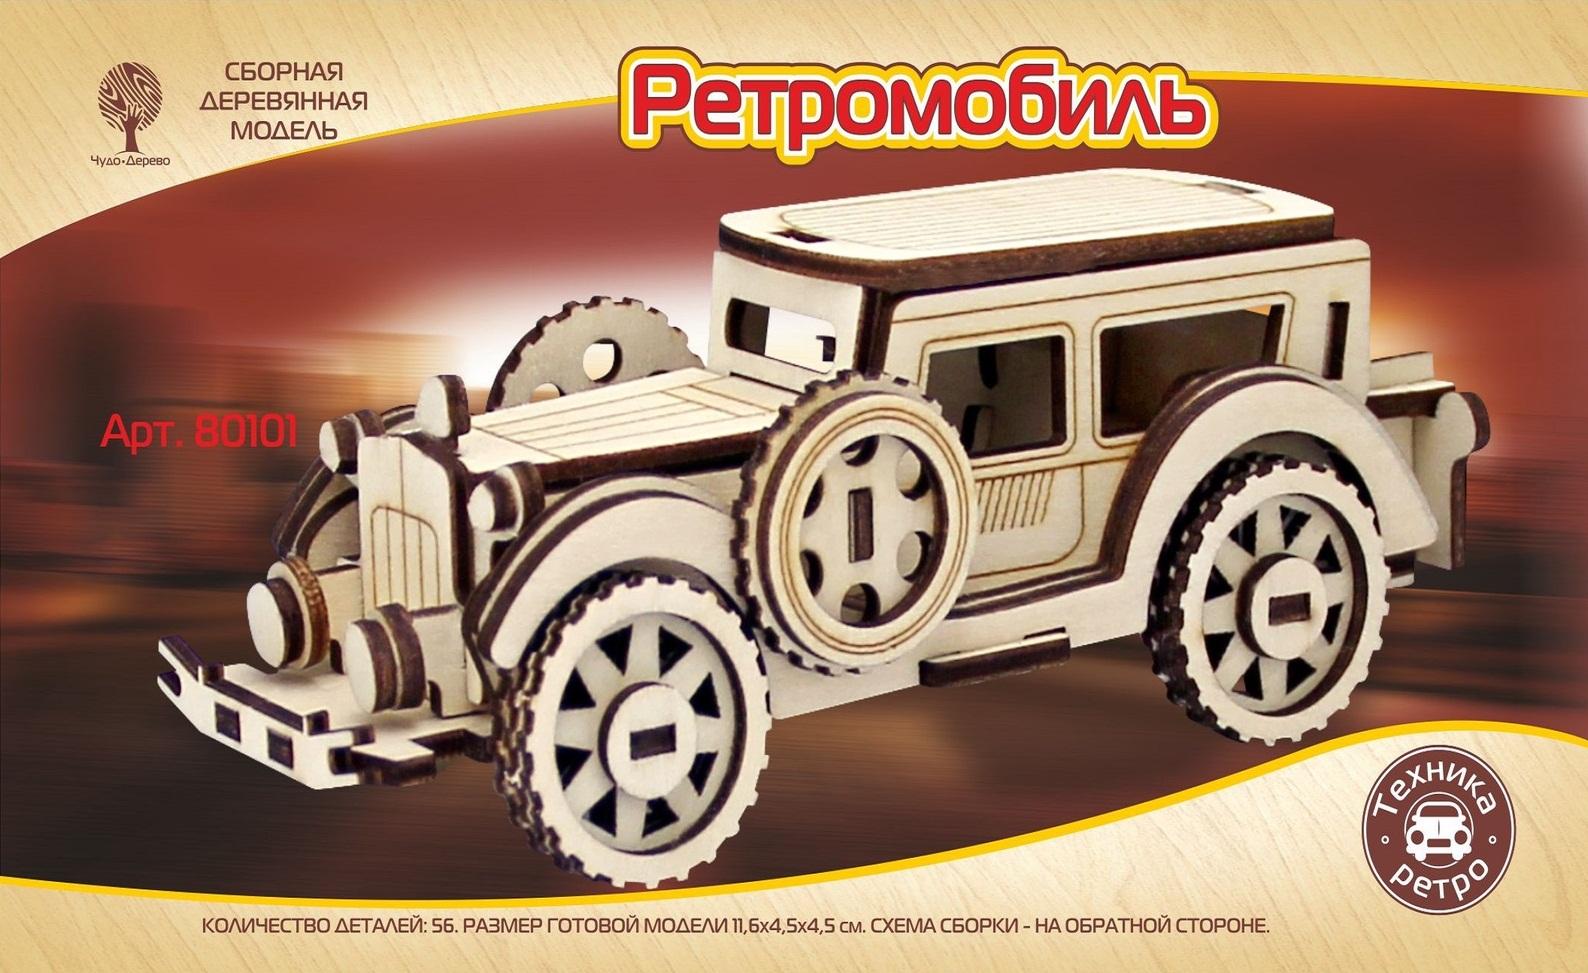 Сборная деревянная mini модель - Транспорт - Ретромобиль-1